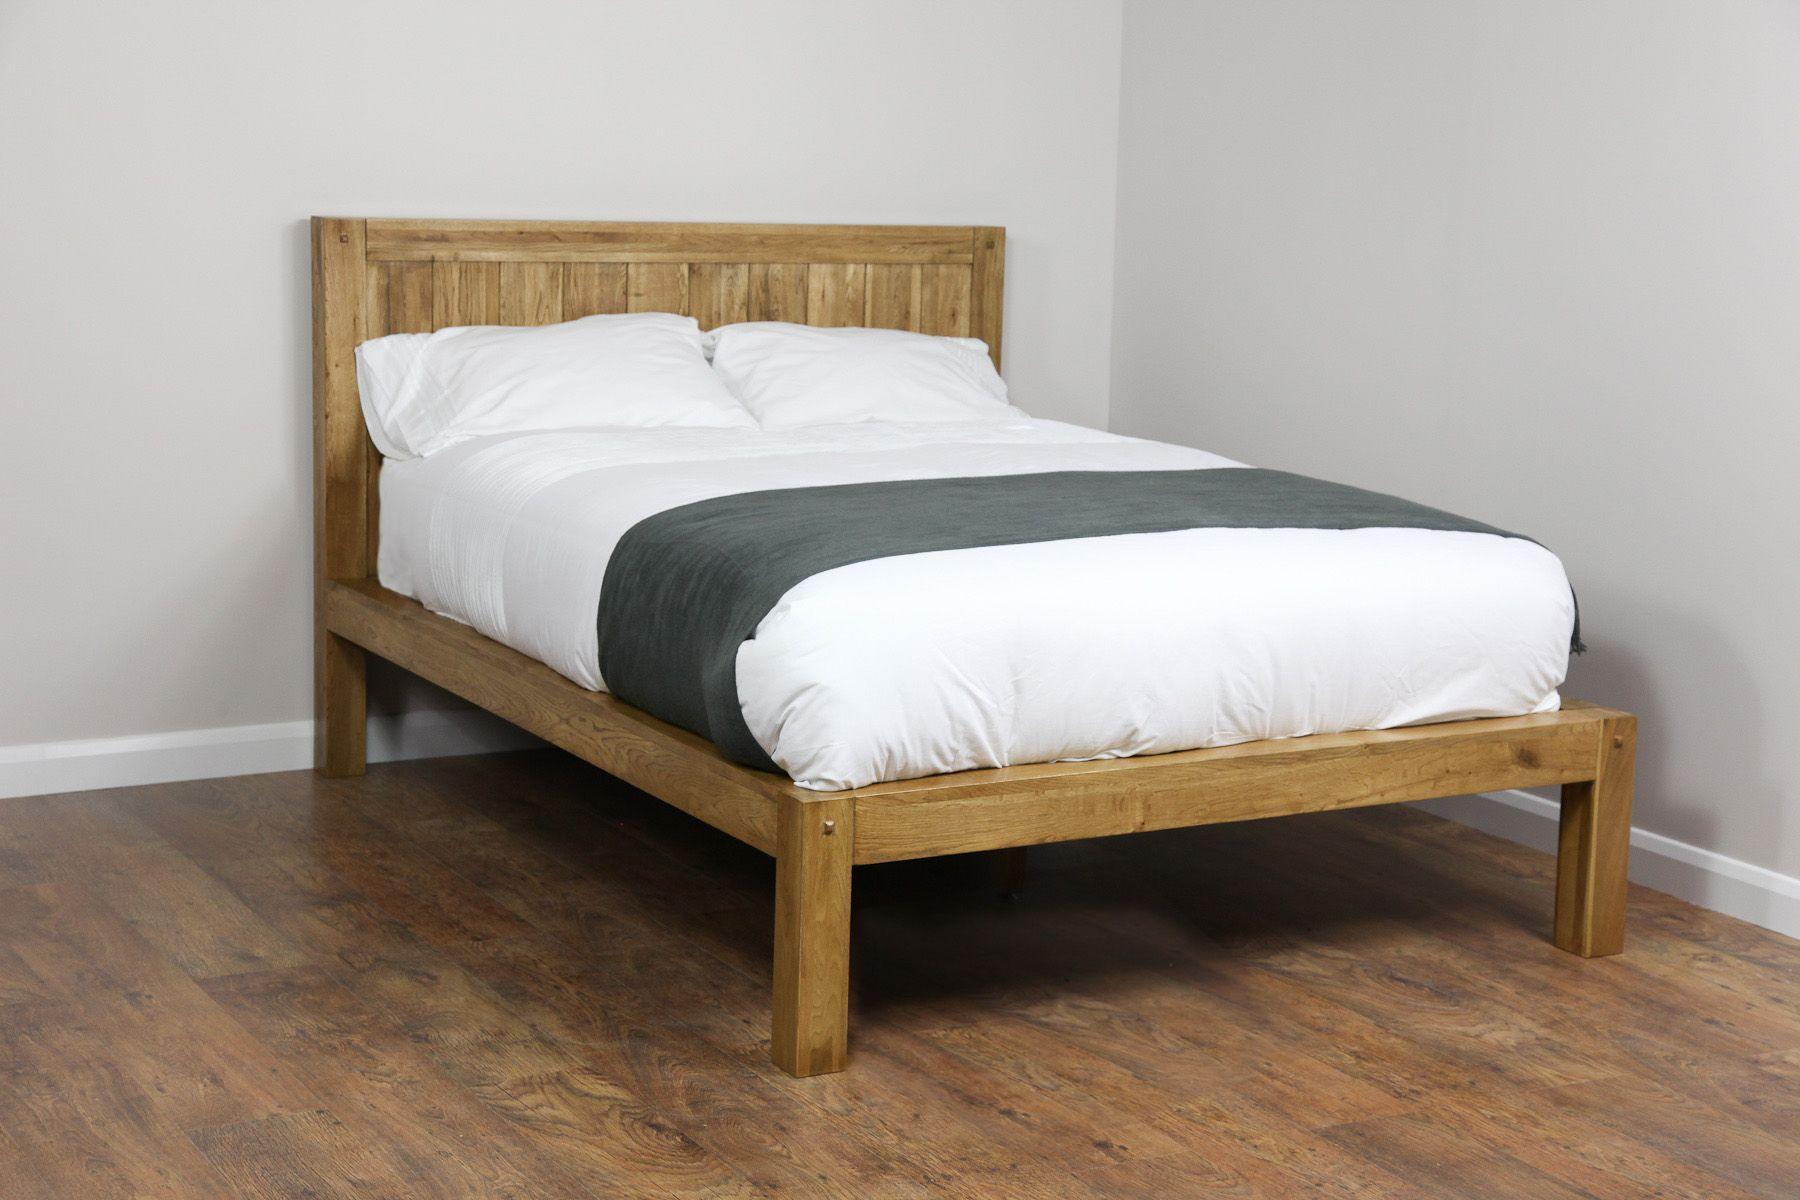 Quercus Solid Oak Furniture Range Bedroom Oak Double Bed Frame Oak Furniture Land Www Oakfurnitureland Co Furniture Solid Oak Furniture Rustic Oak Furniture